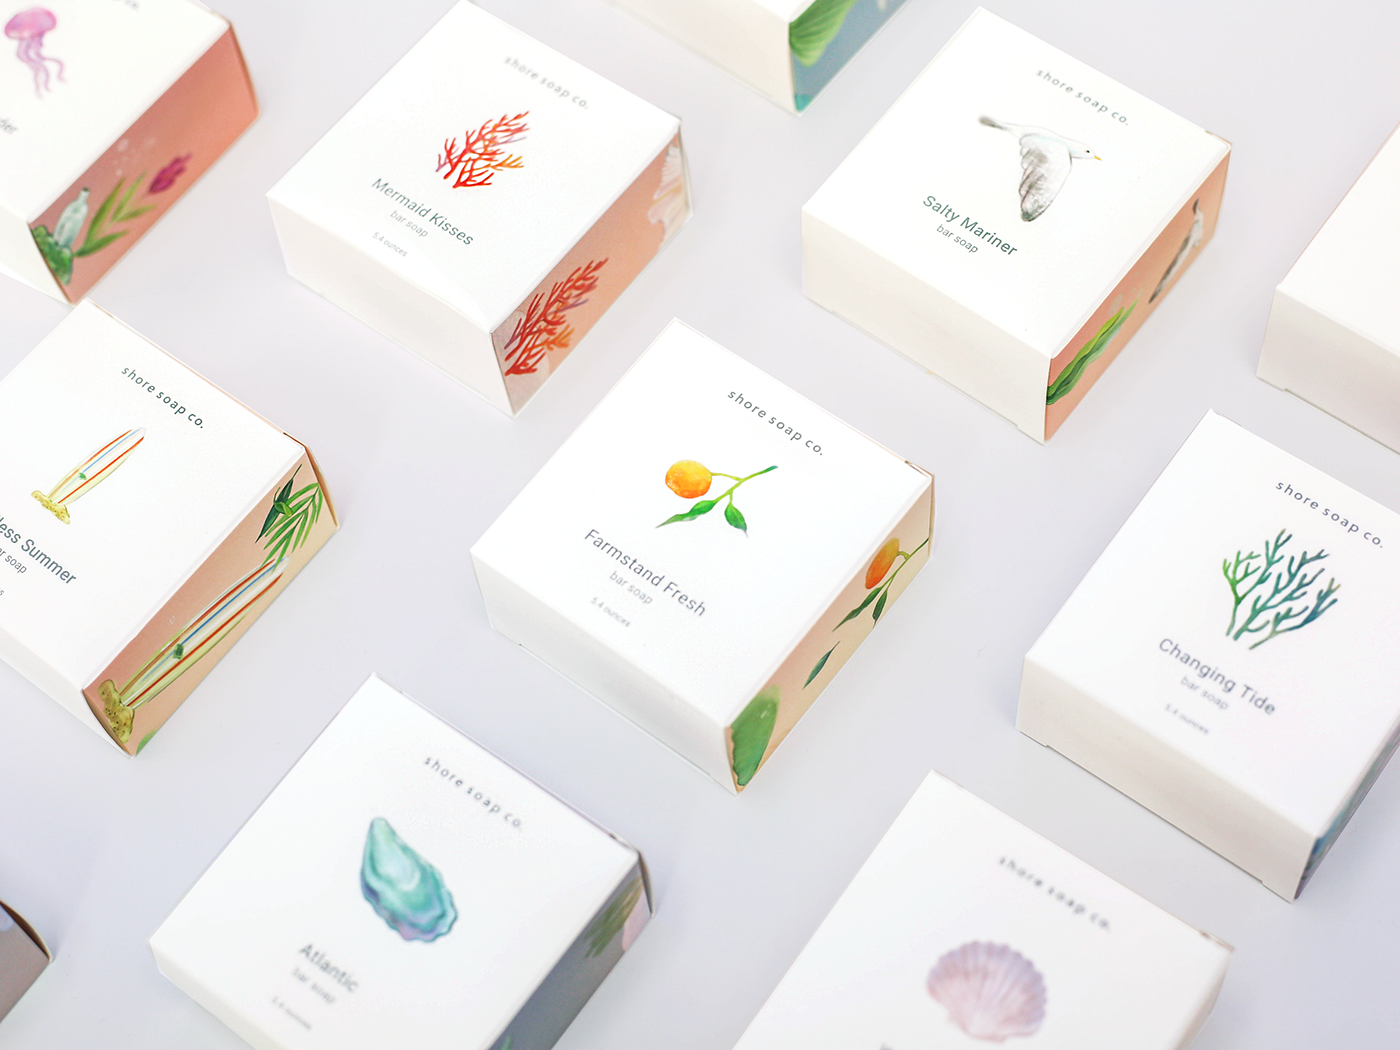 soap illustrationpackaging watercolorpackaging Ocean sea cosmetic packaging ecofriendly Nature candle adobeawards